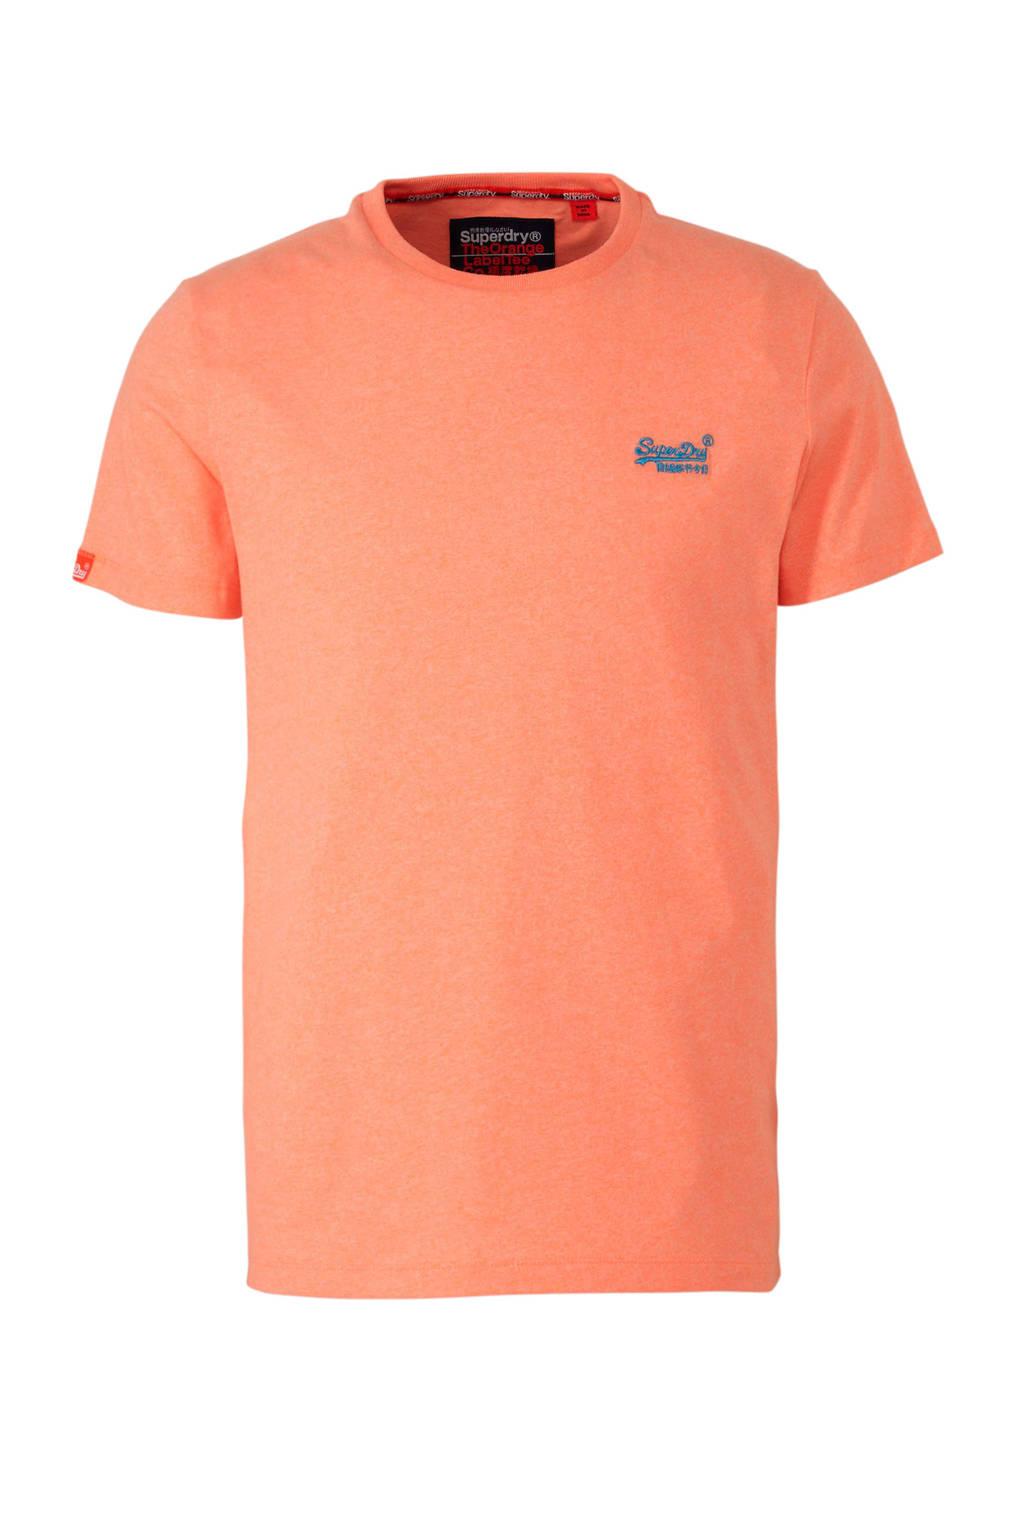 Superdry T-shirt oranje, Oranje